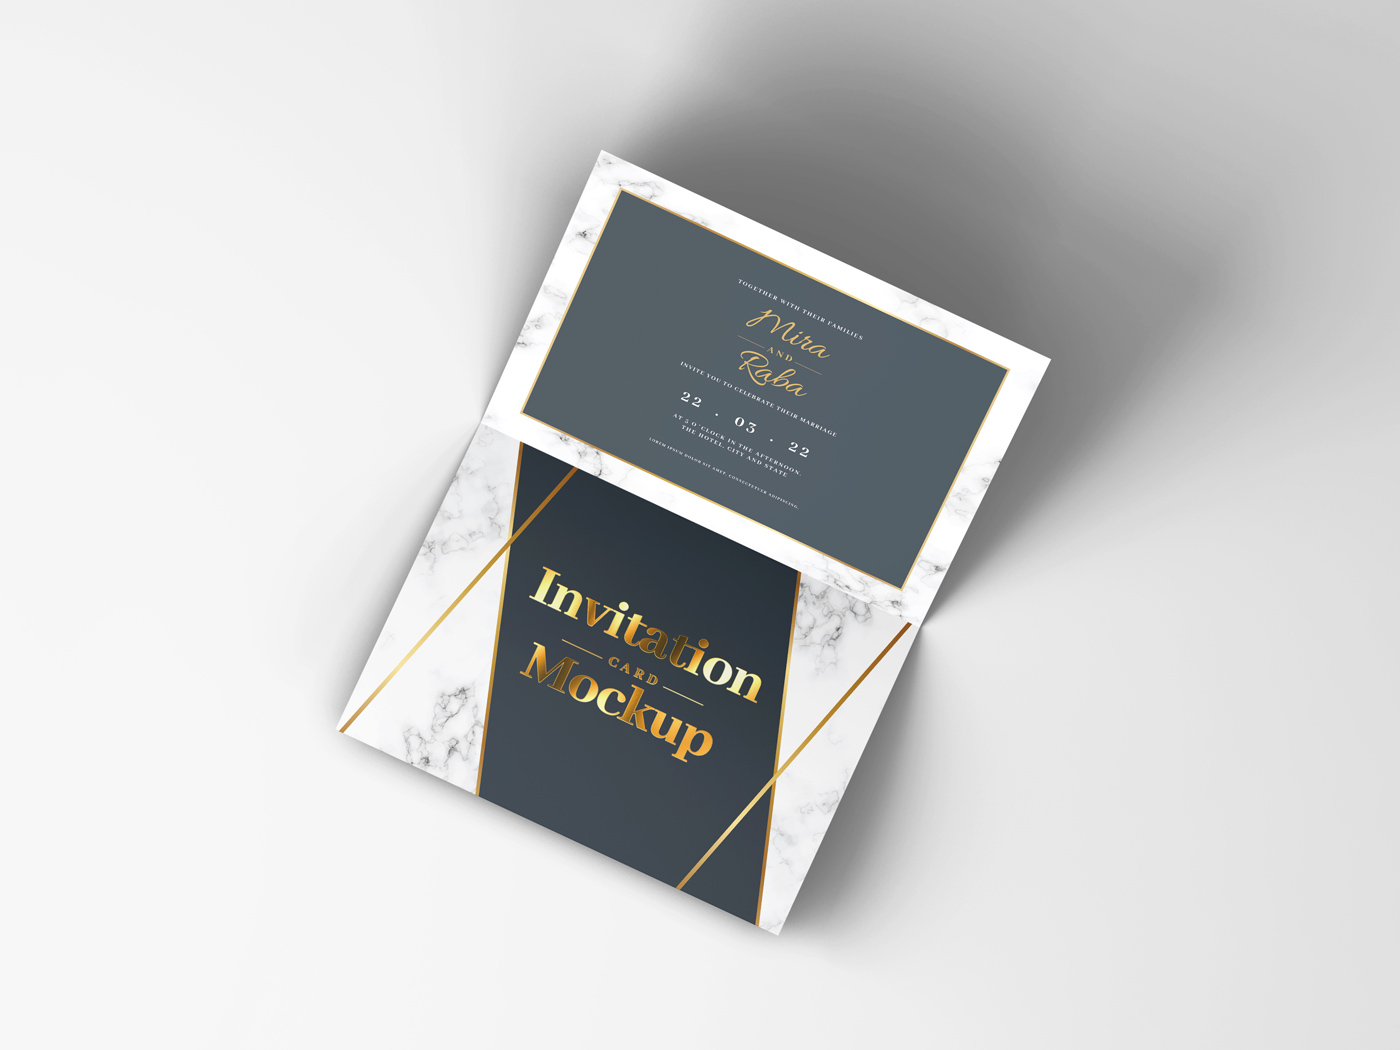 Invitation Card Mockups V1 example image 6